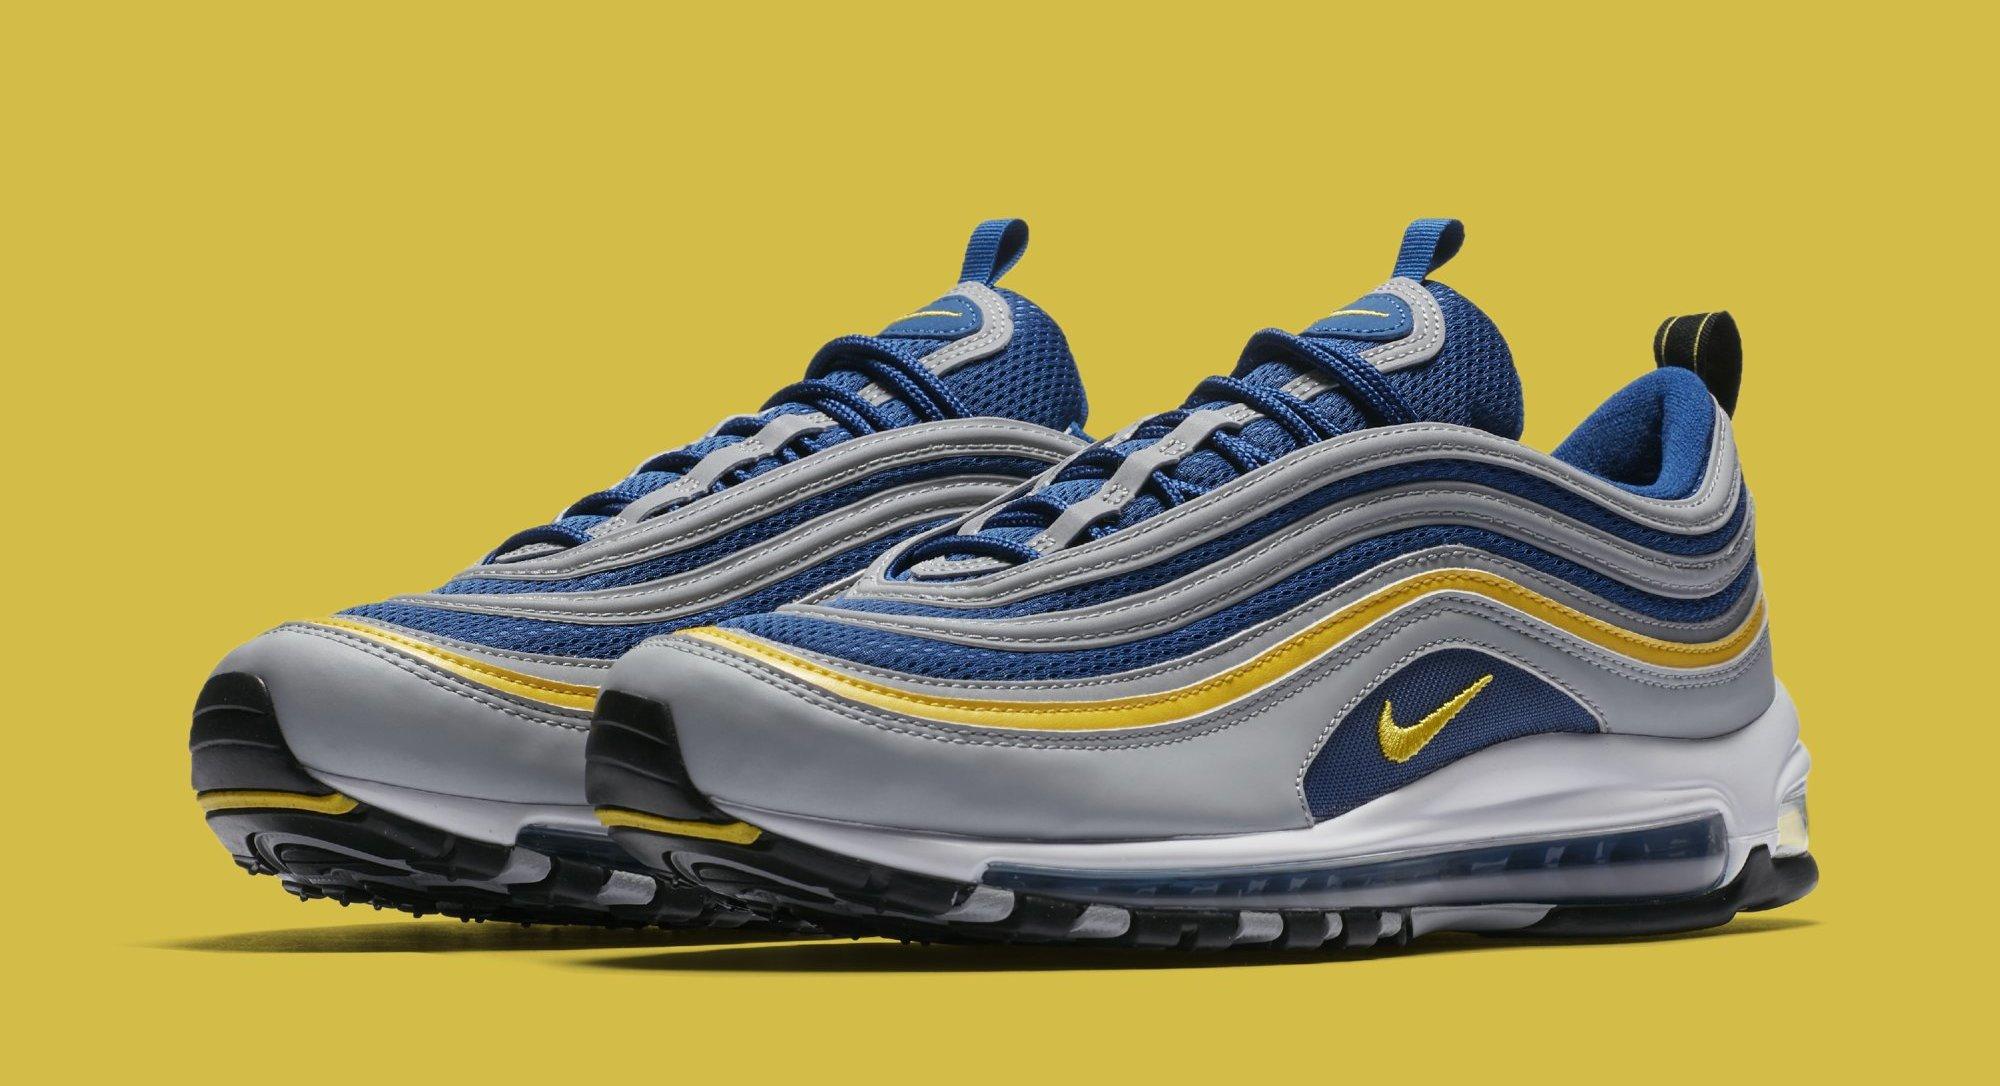 e142cf584e536 Nike Air Max 97  Wolf Grey Tour Yellow Gym Blue  921826-006 Release Date